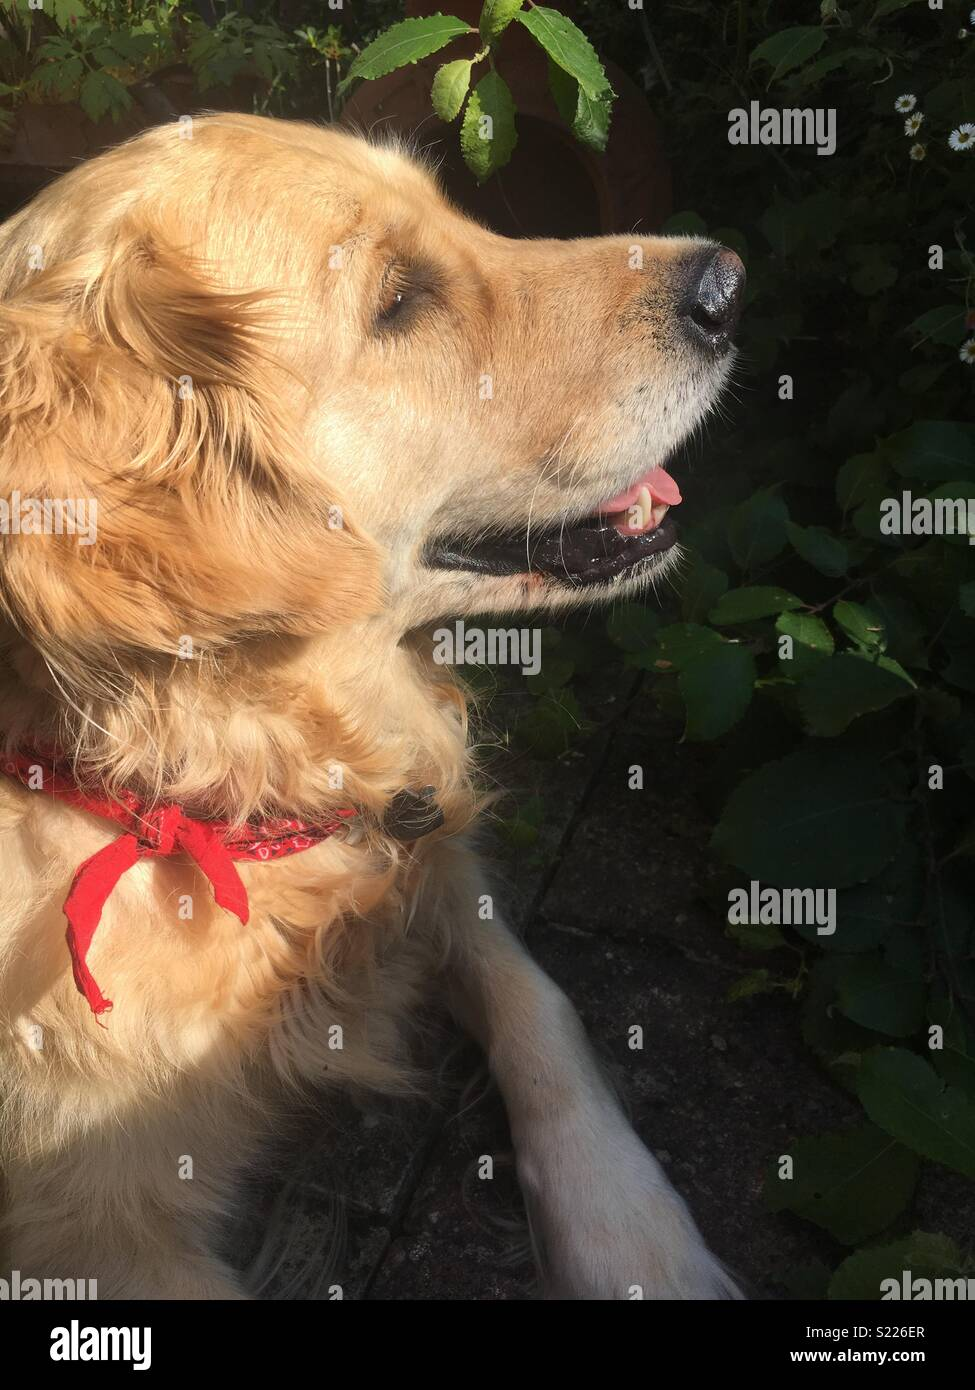 Golden retriever in summer - Stock Image